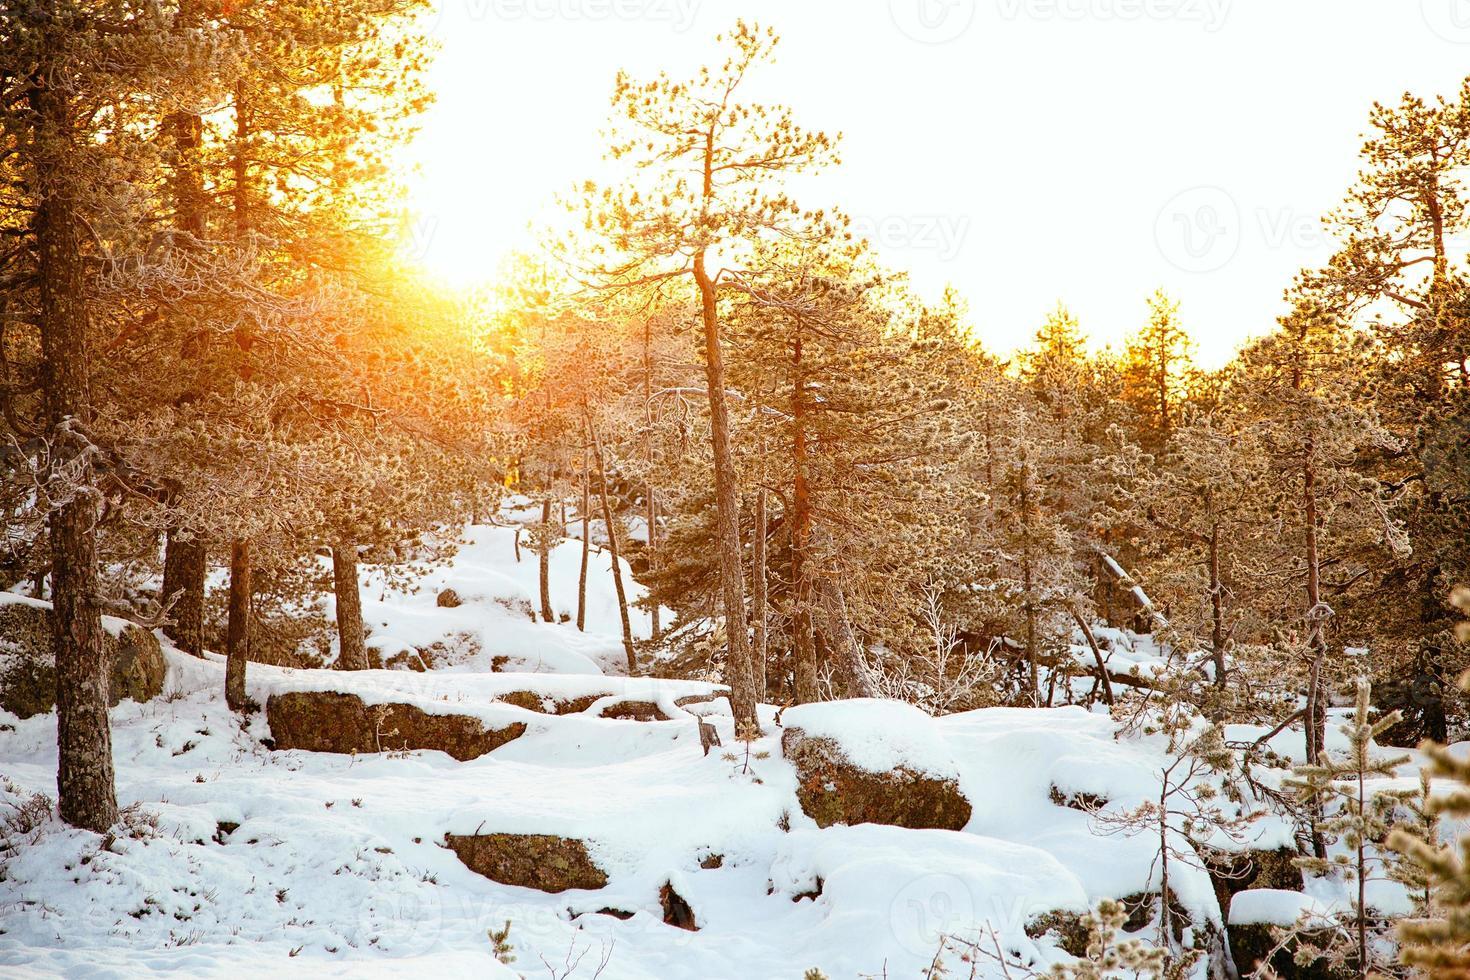 Wintertag foto